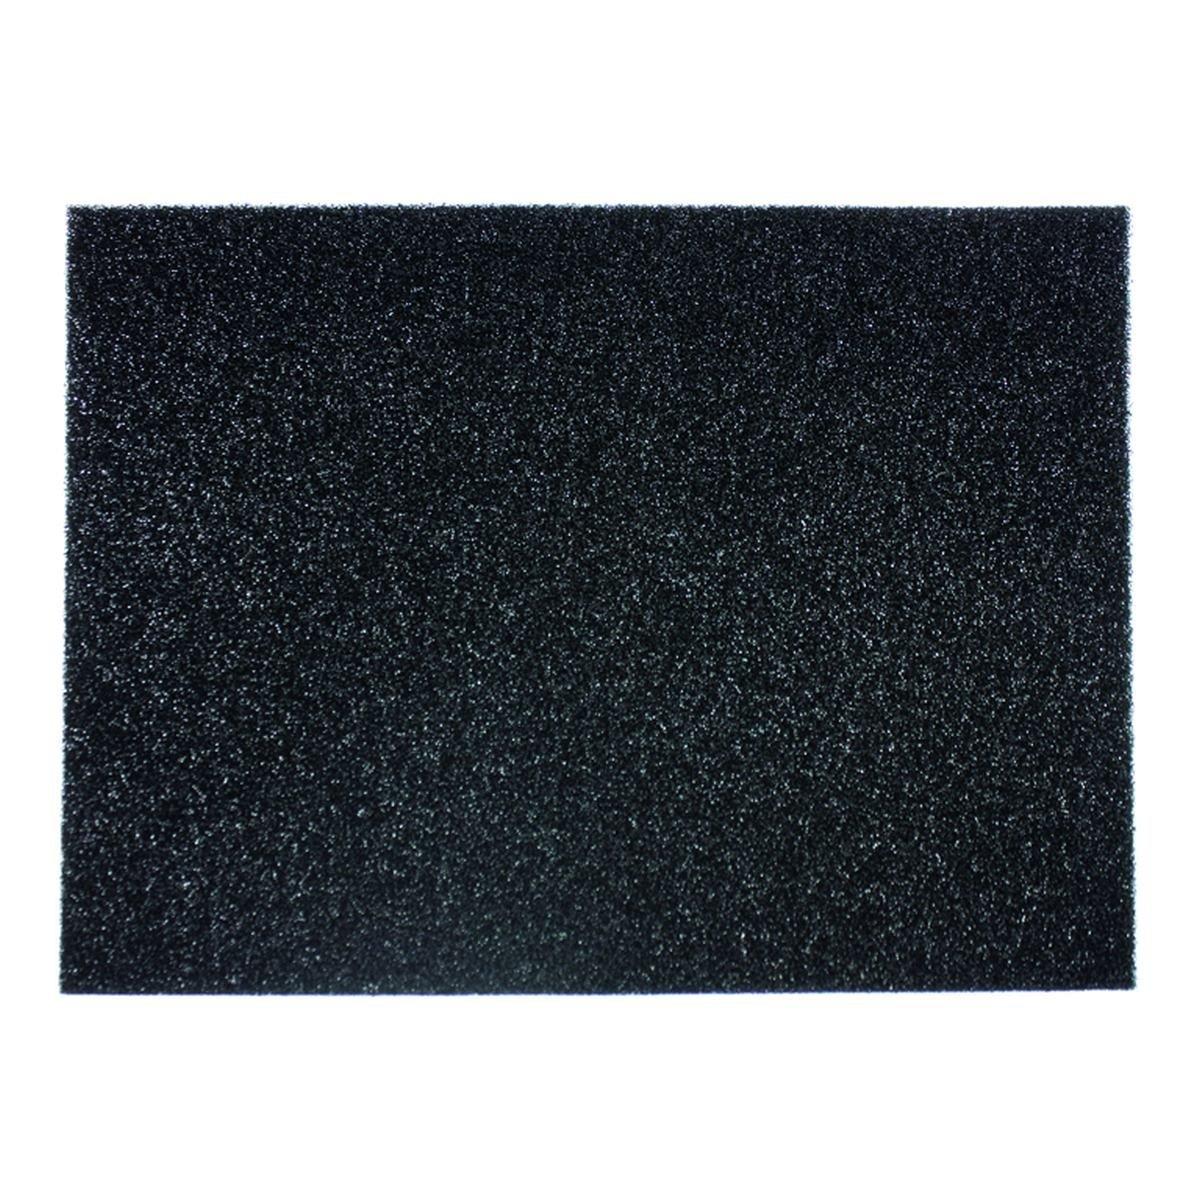 Fedtfilter klipbart 360x250x10mm